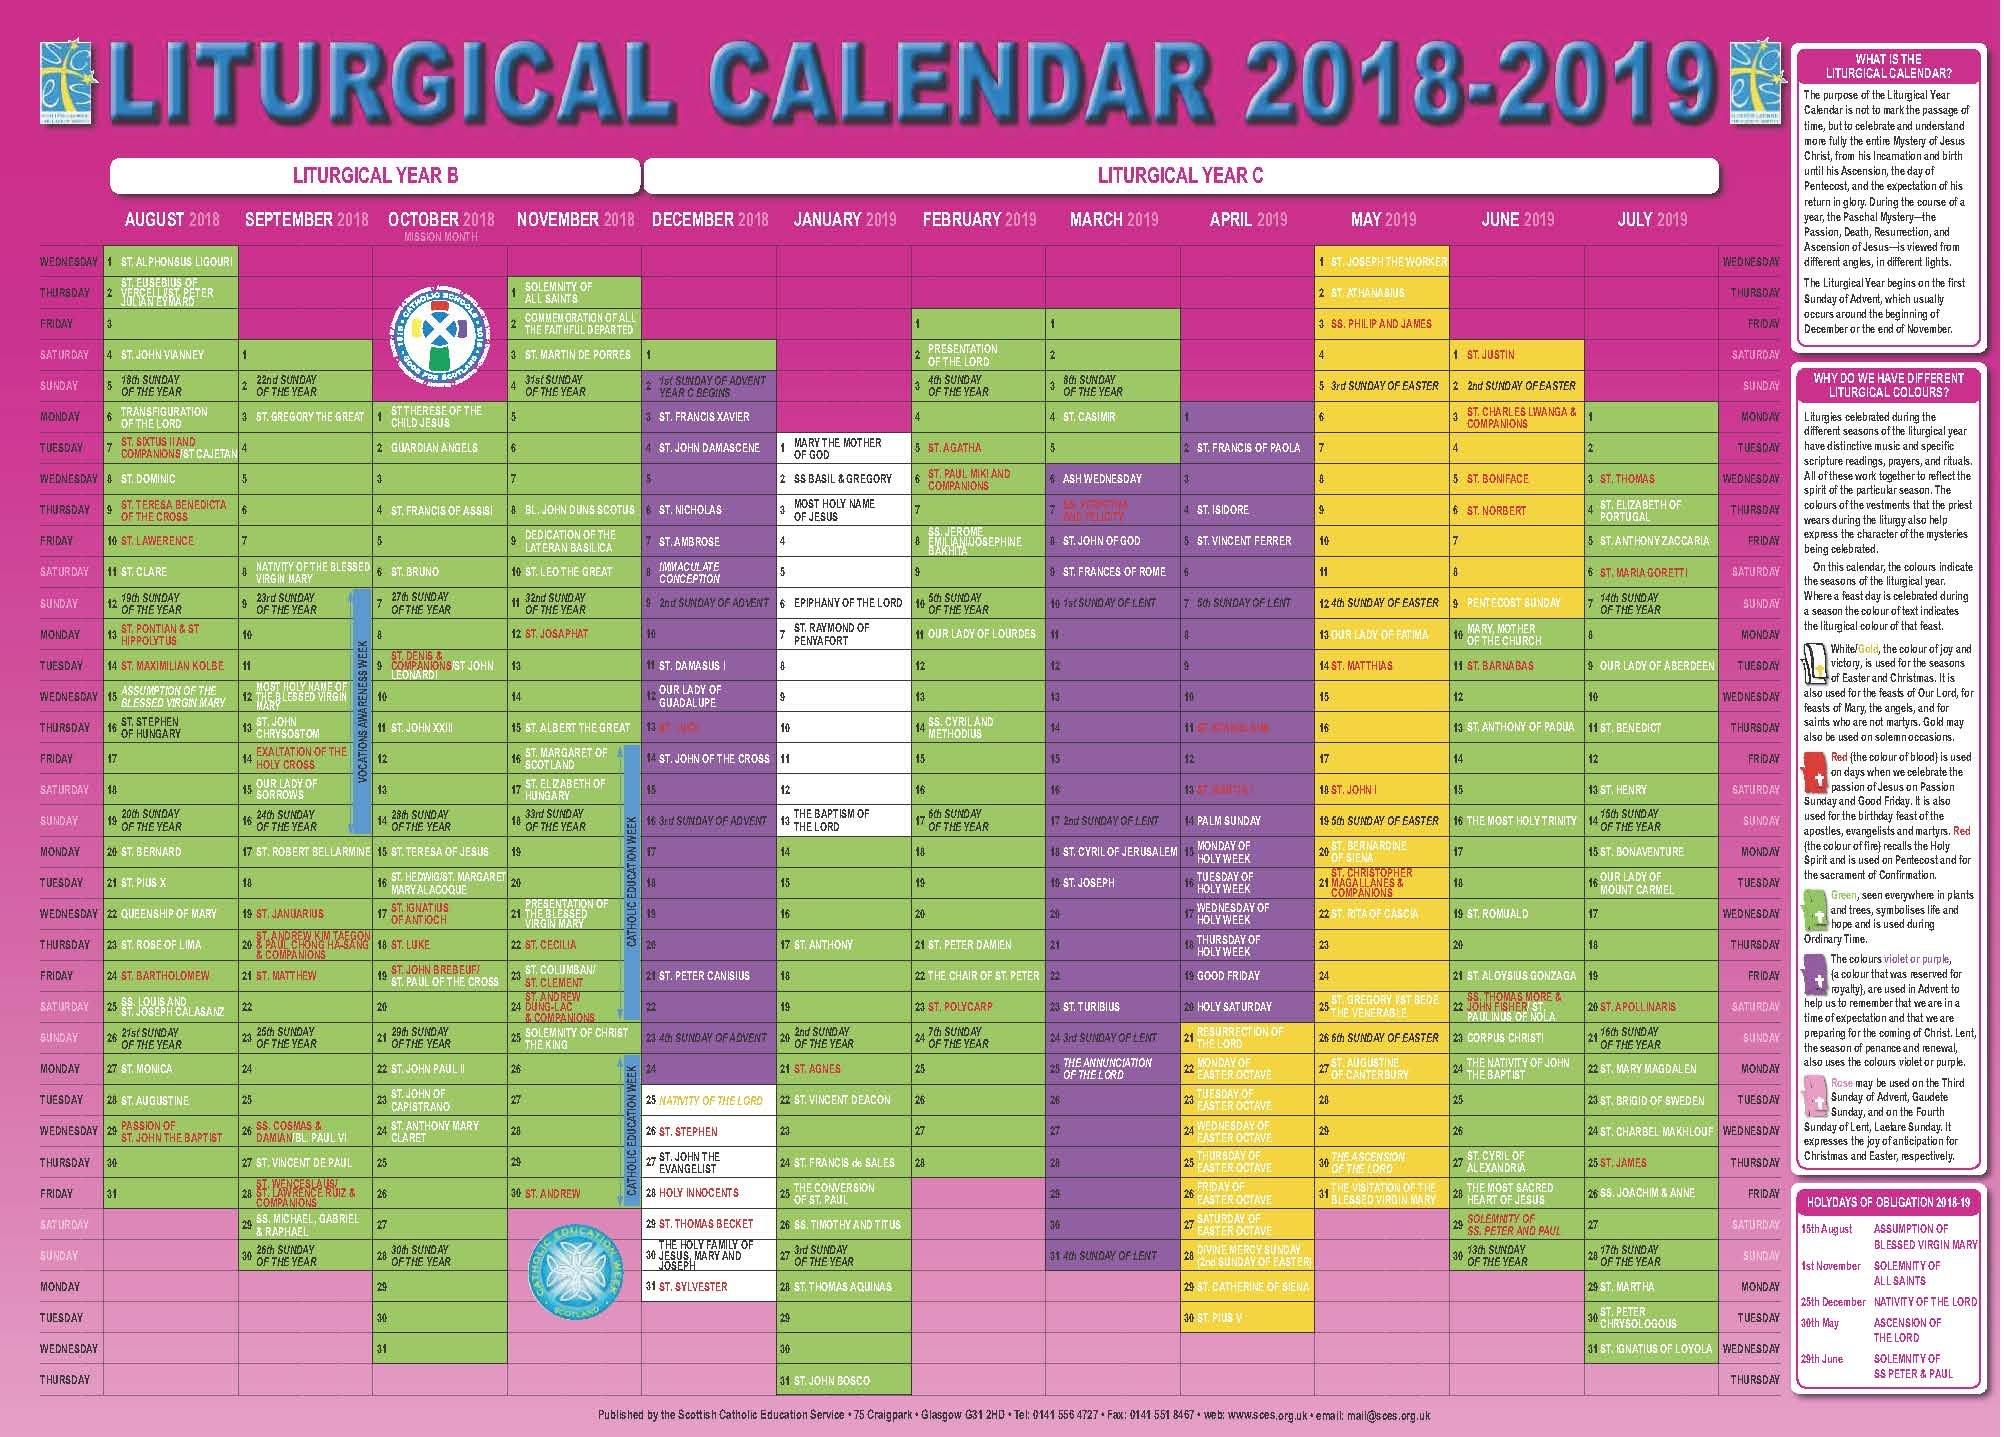 Scottish Catholic Education Service | Sces | Liturgical Calendar Calendar 2019 Catholic